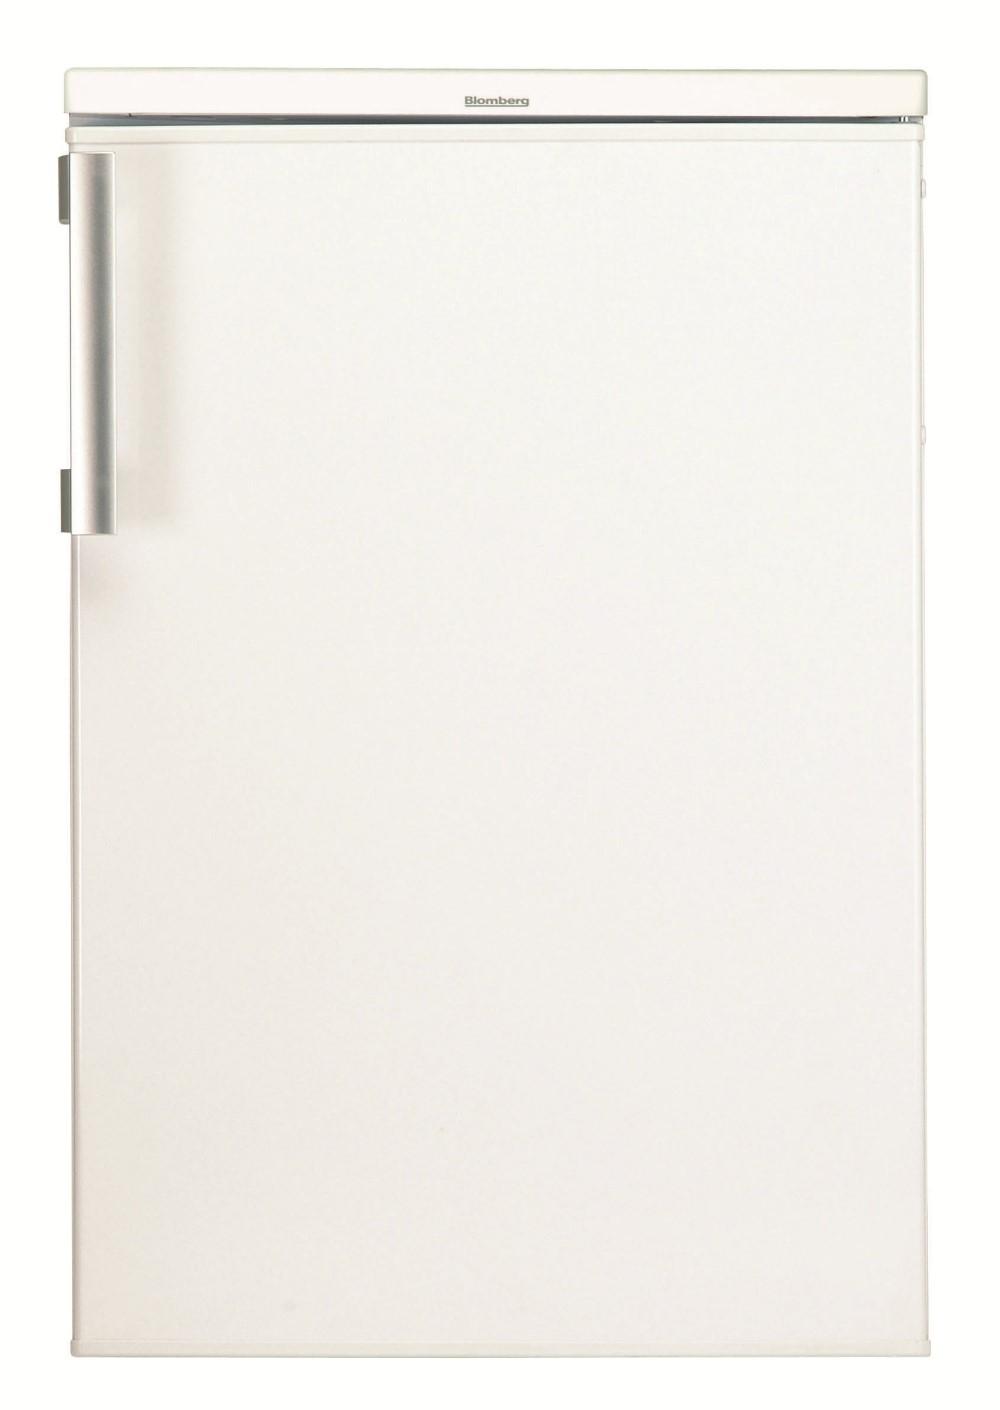 Blomberg TSM1541 A++ Tisch-Kühlschrank/ Energieeffizienzklasse A++